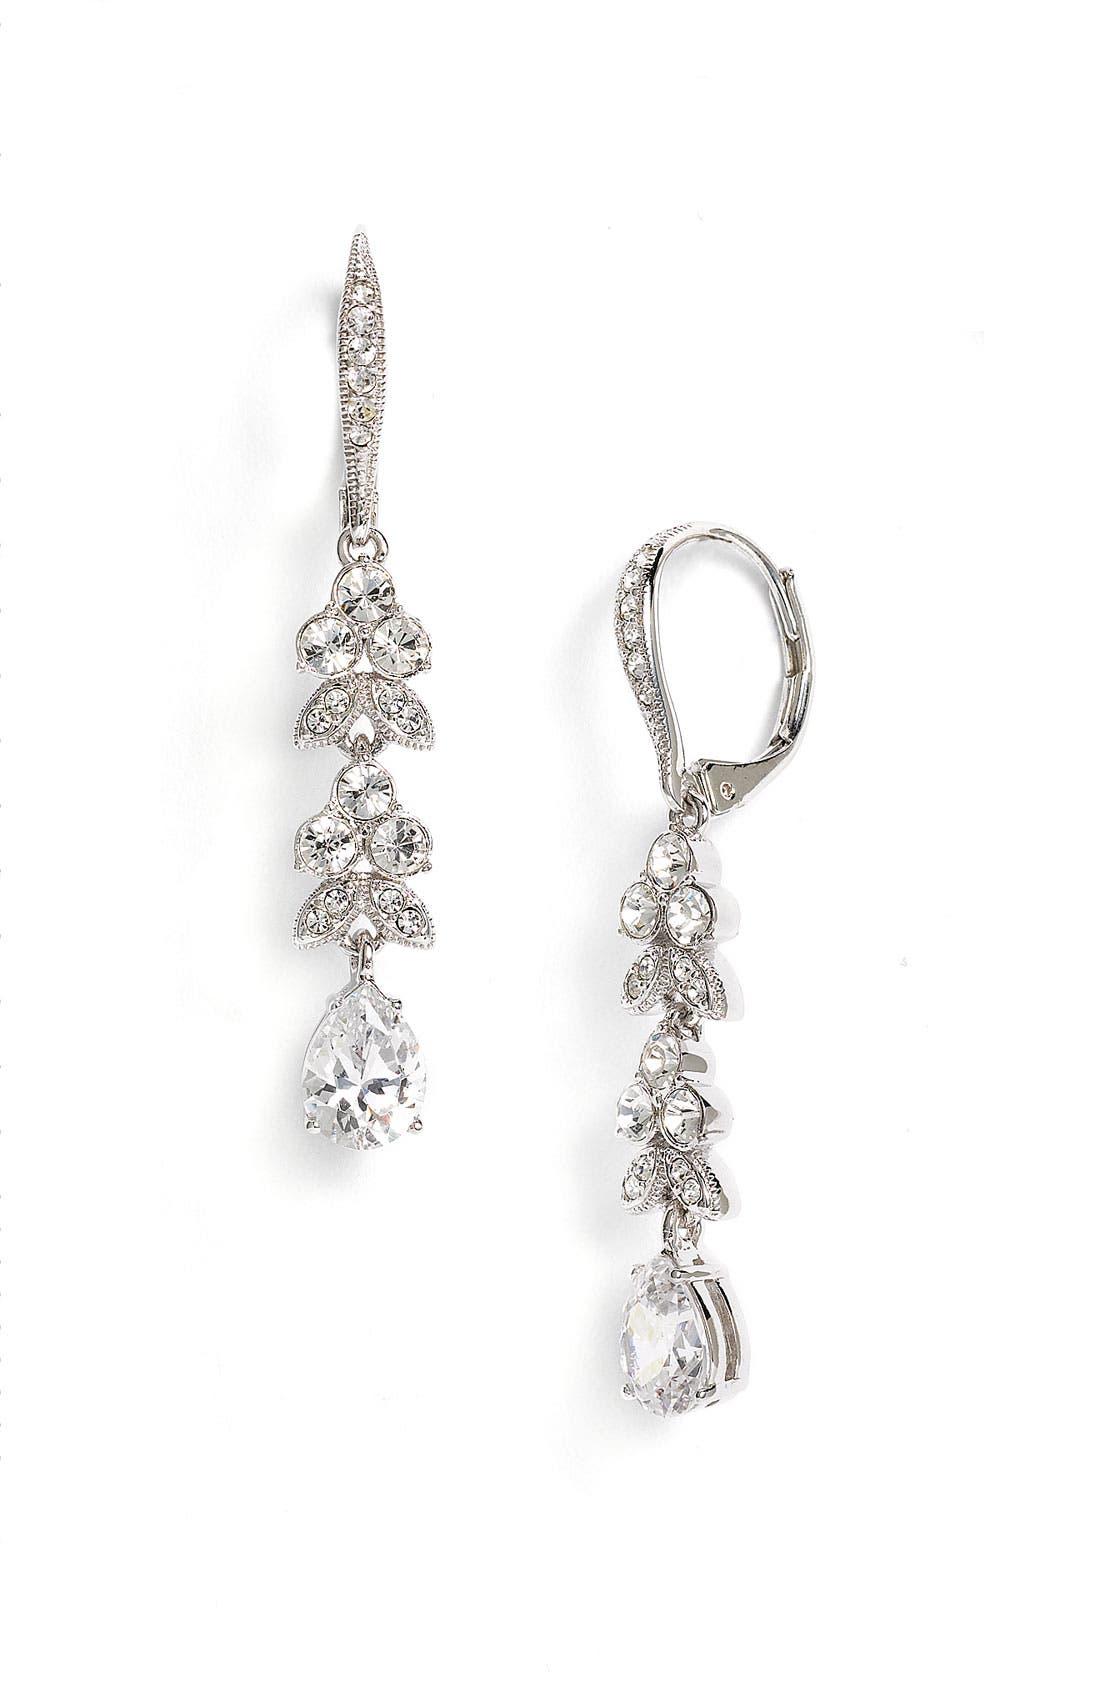 Main Image - Nadri Leaf & Pear Drop Earrings